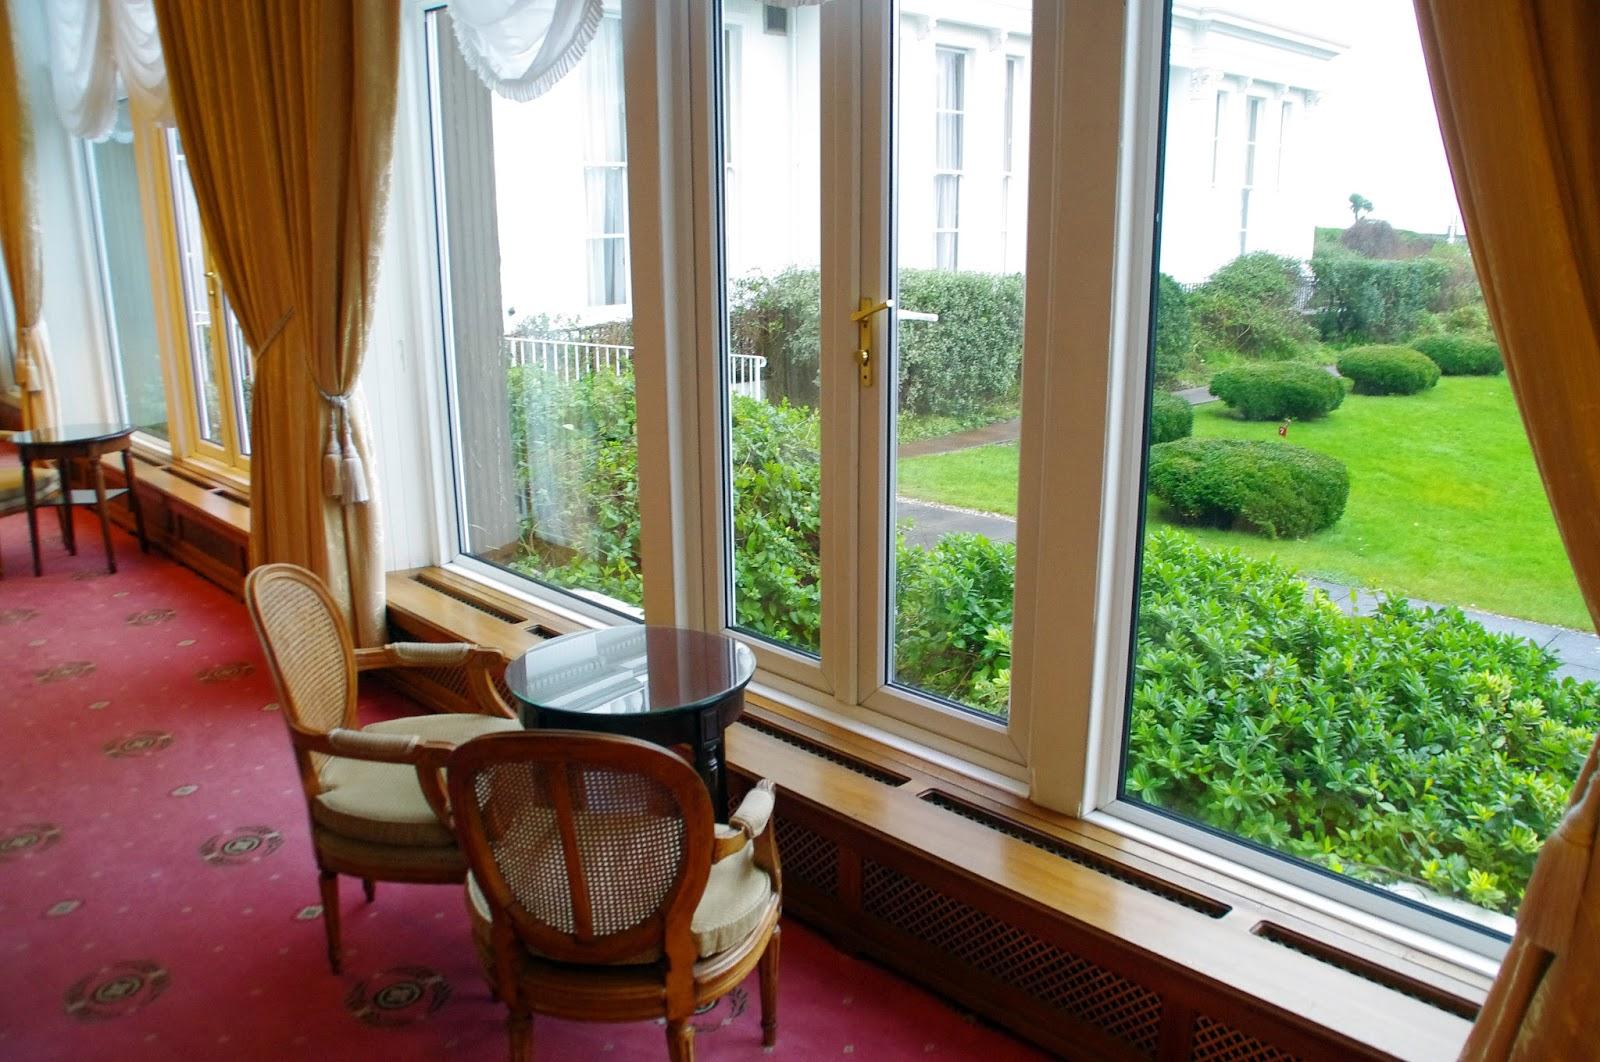 The Grand Hotel Eastbourne Interior